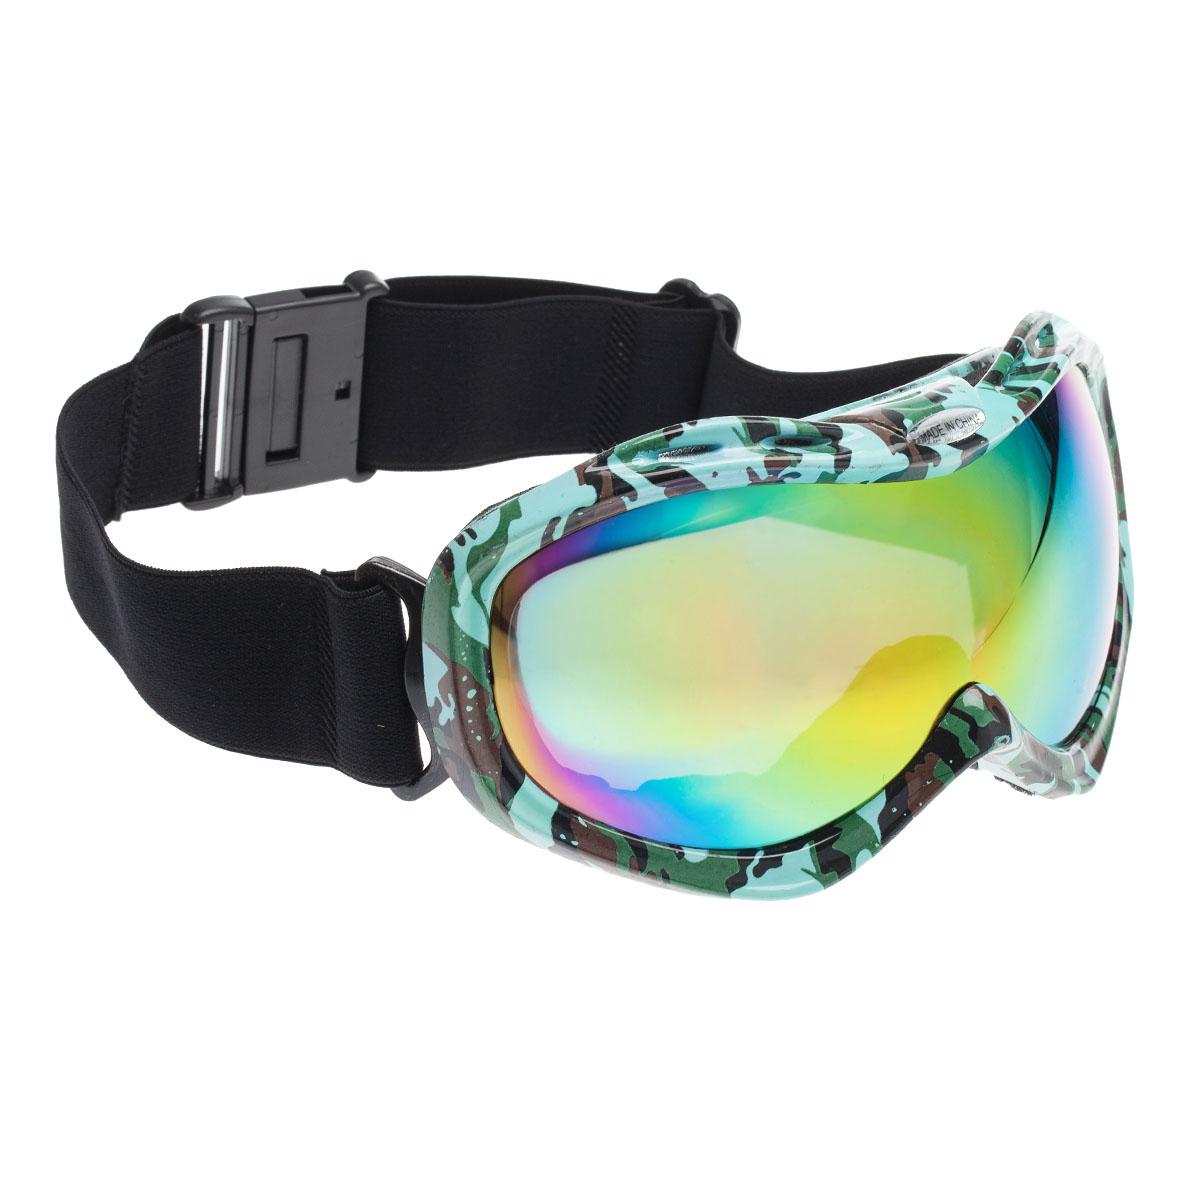 очки горнолыжные vcan ag0172 vse64 Горнолыжные очки Exparc, 15653-2